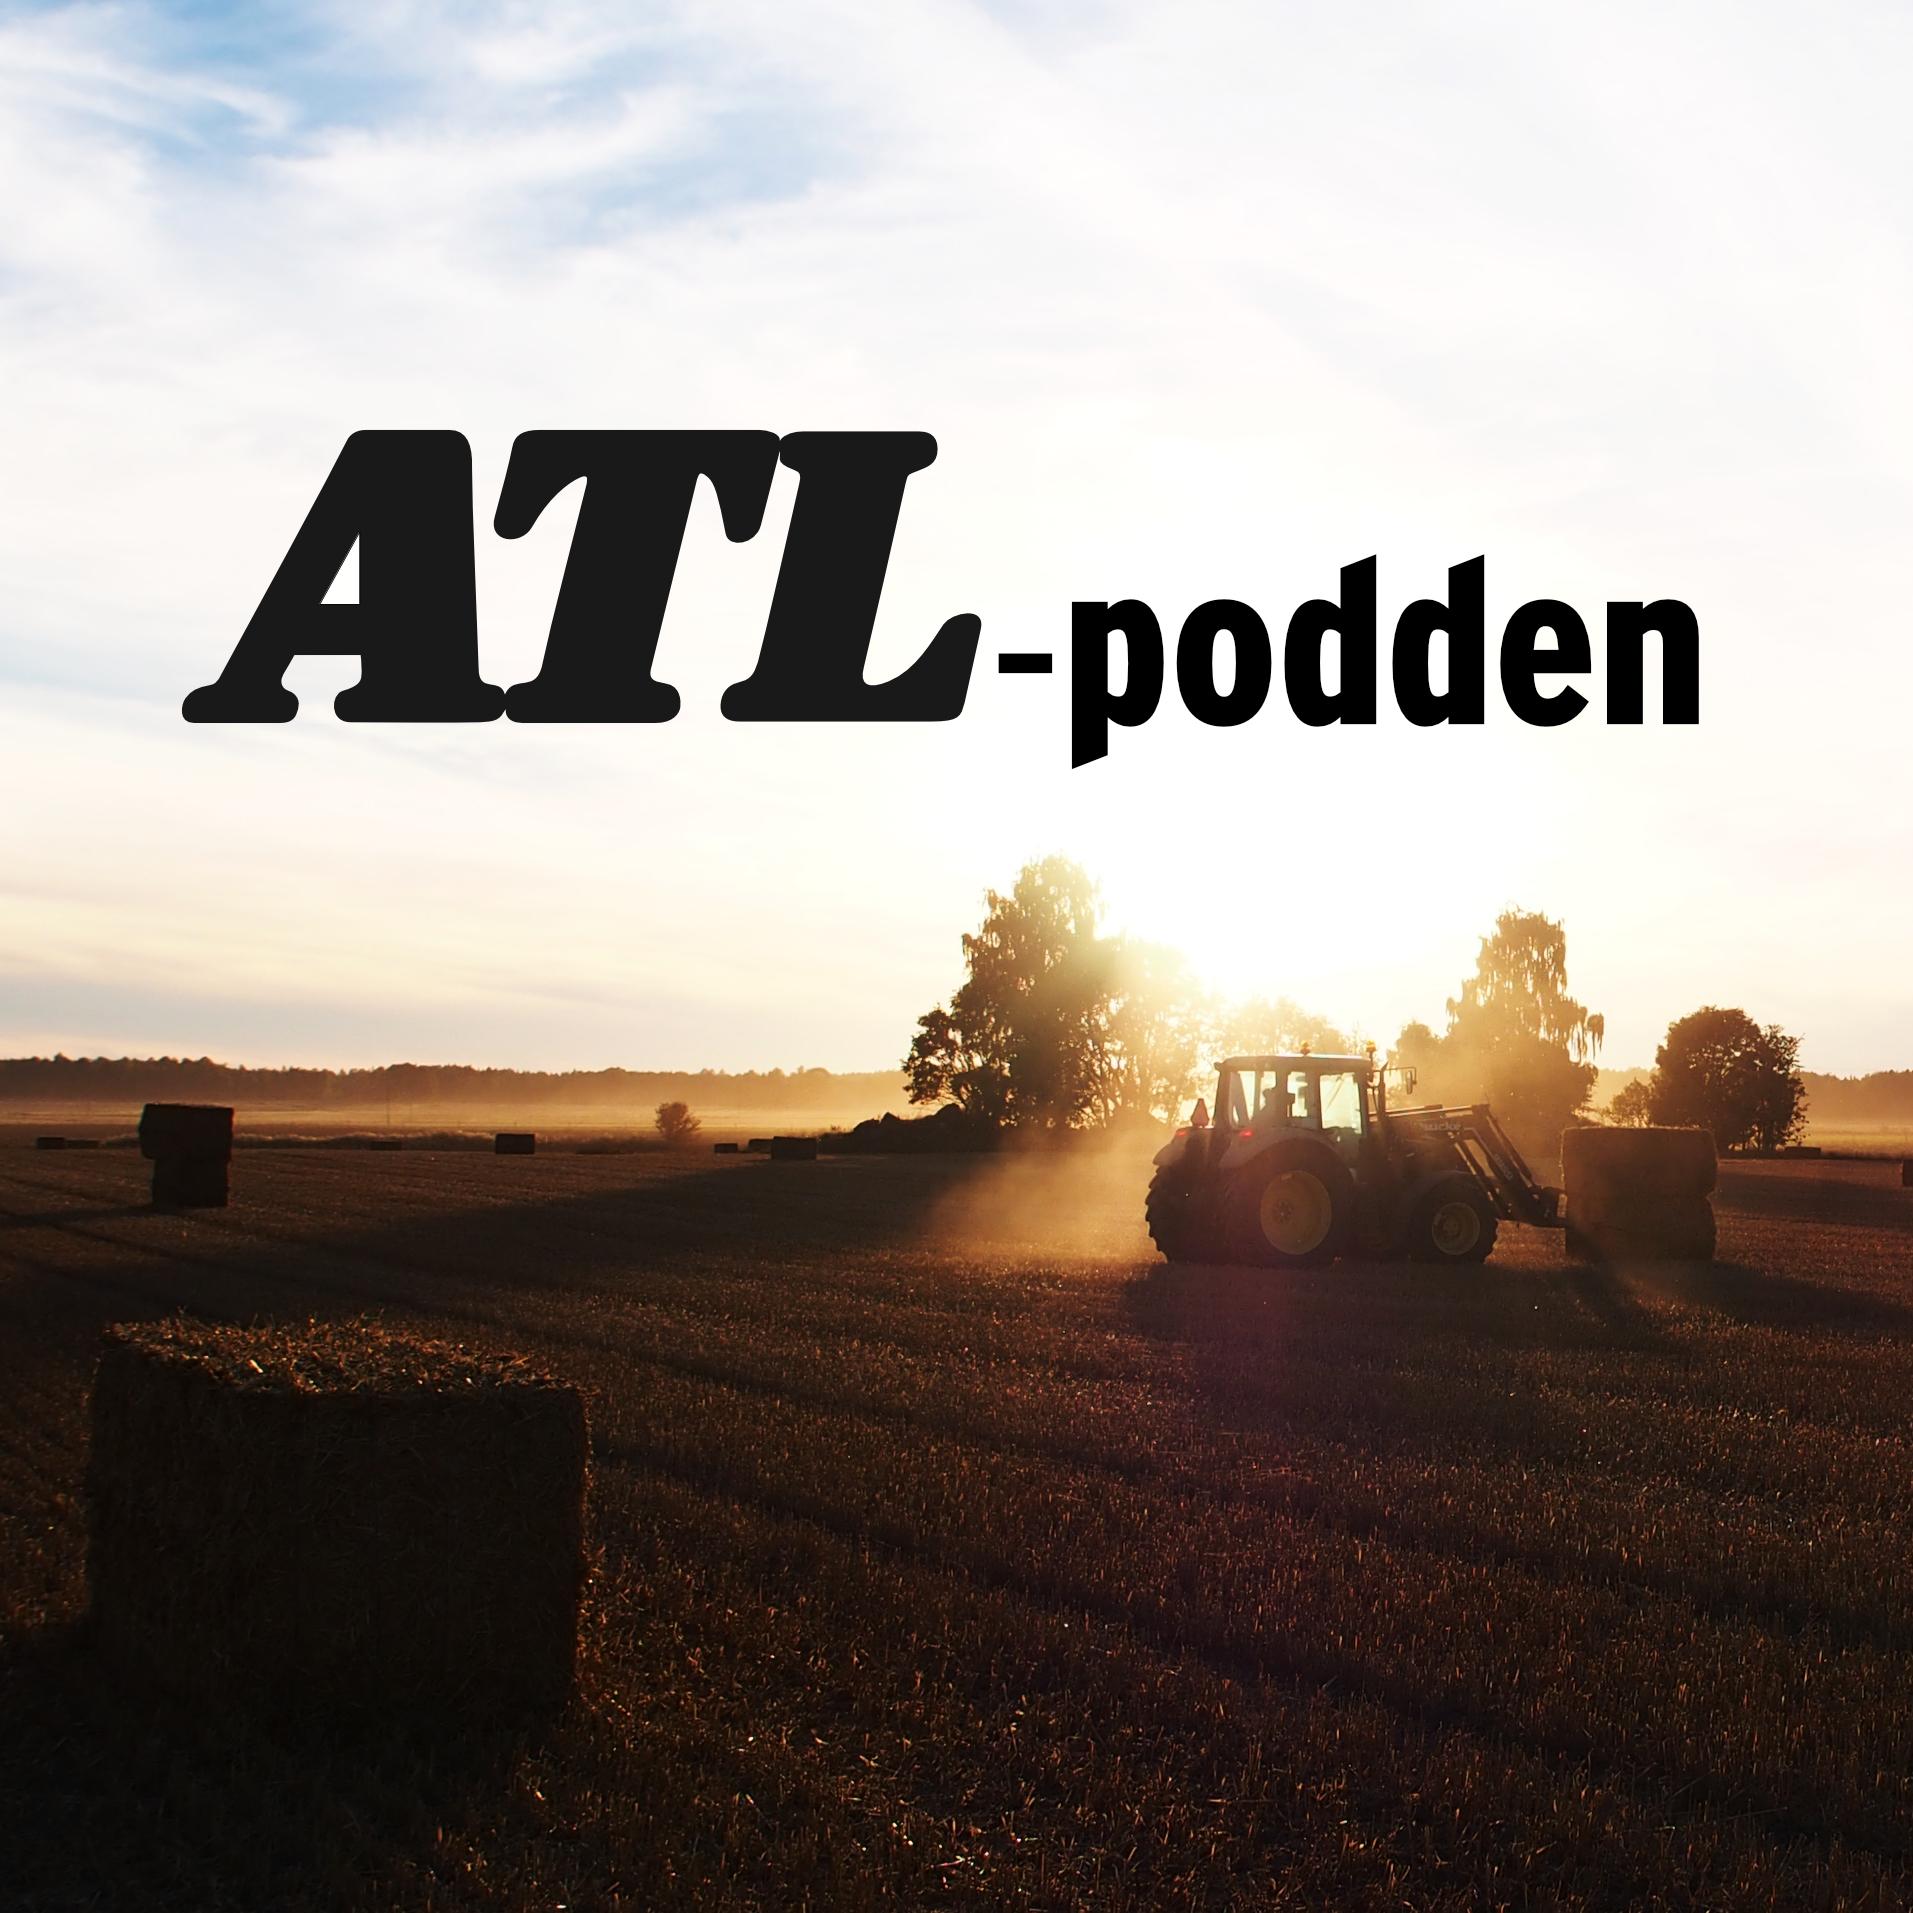 ATL-podden show art